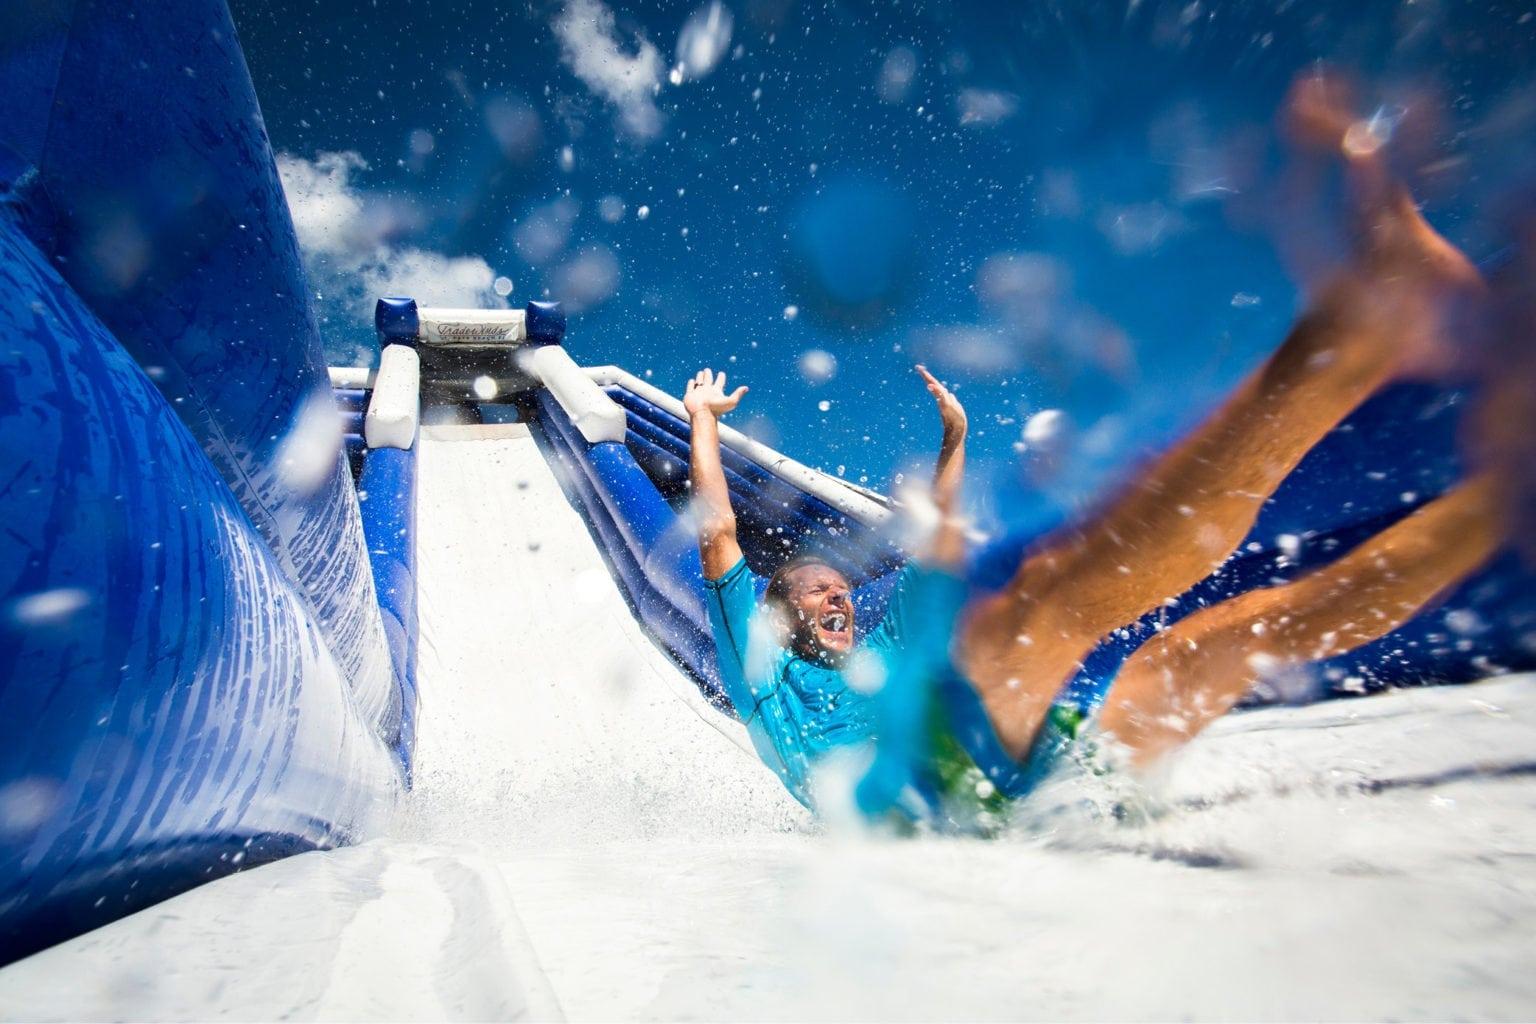 inflatable waterslide rentals in Murfreesboro